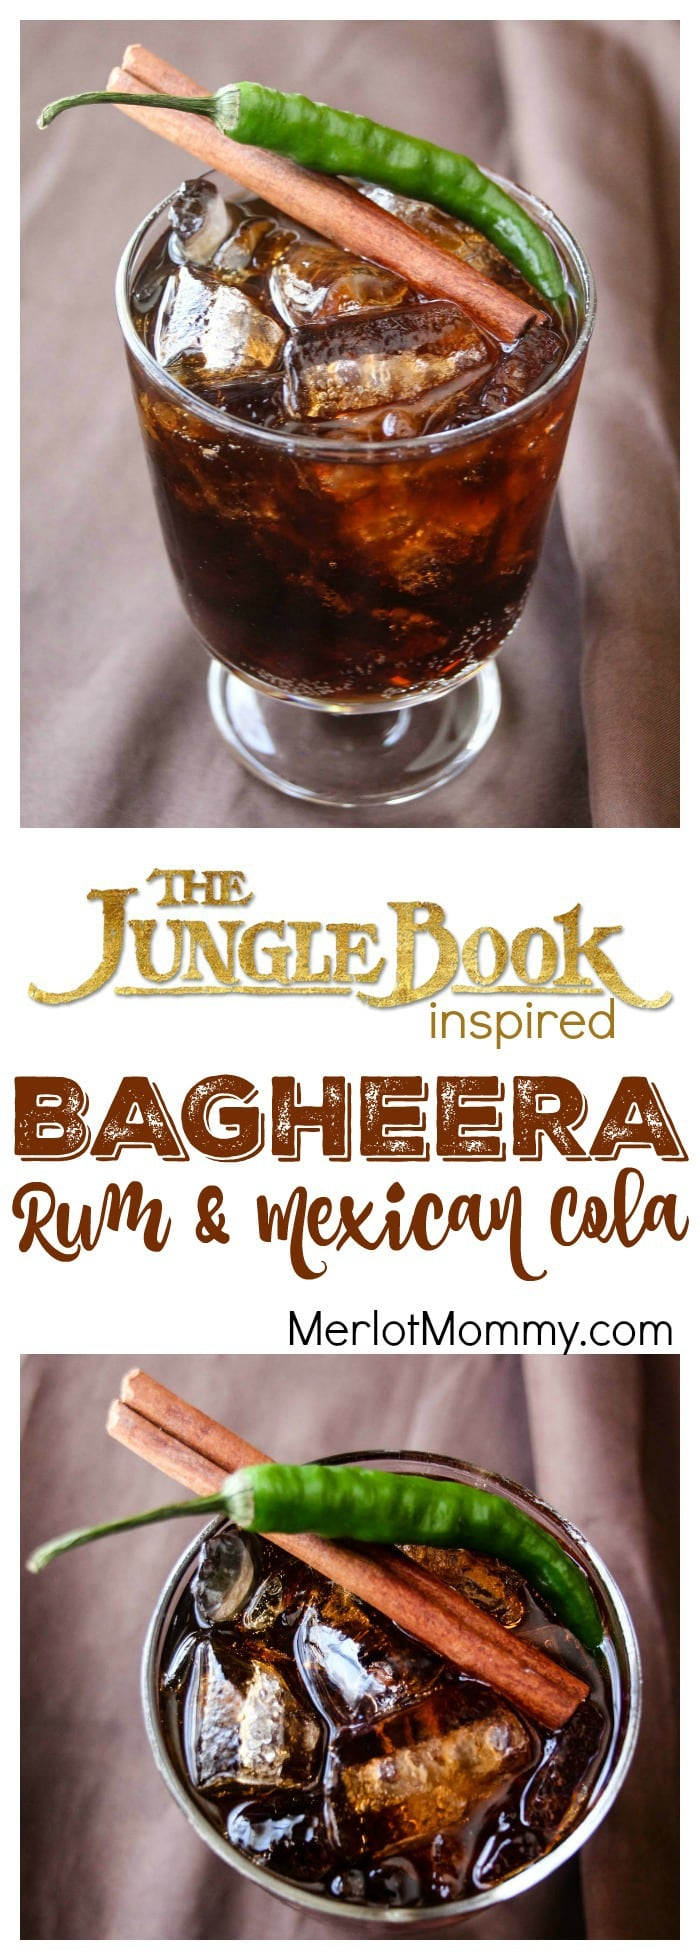 Bagheera Rum & Mexican Cola: Disney Jungle Book-Inspired Cocktail